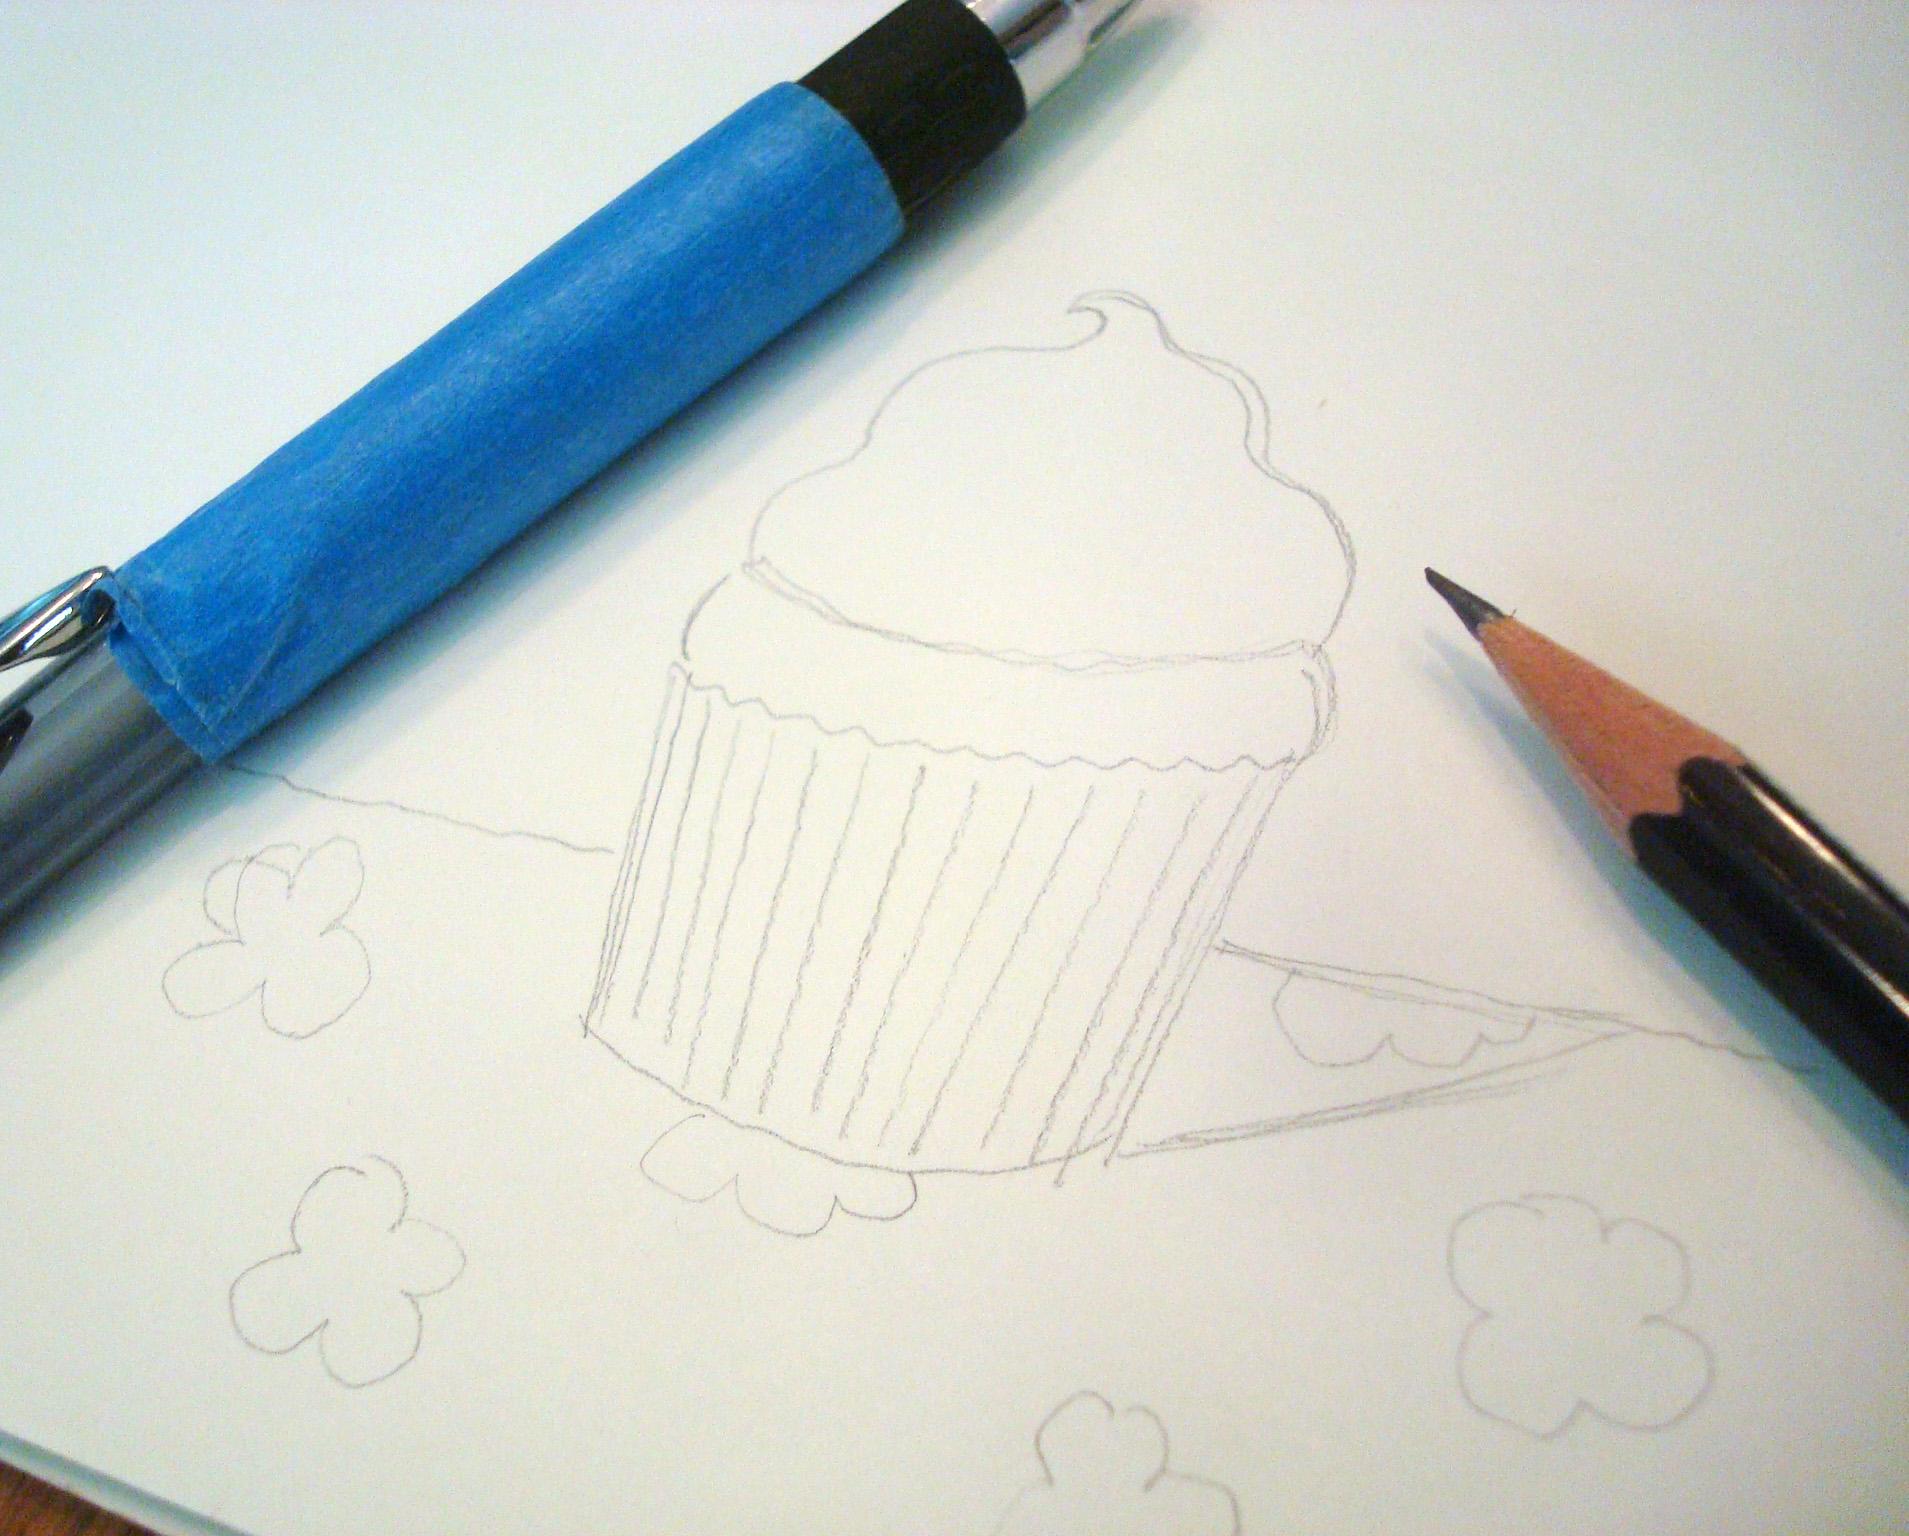 Sketch before stippling